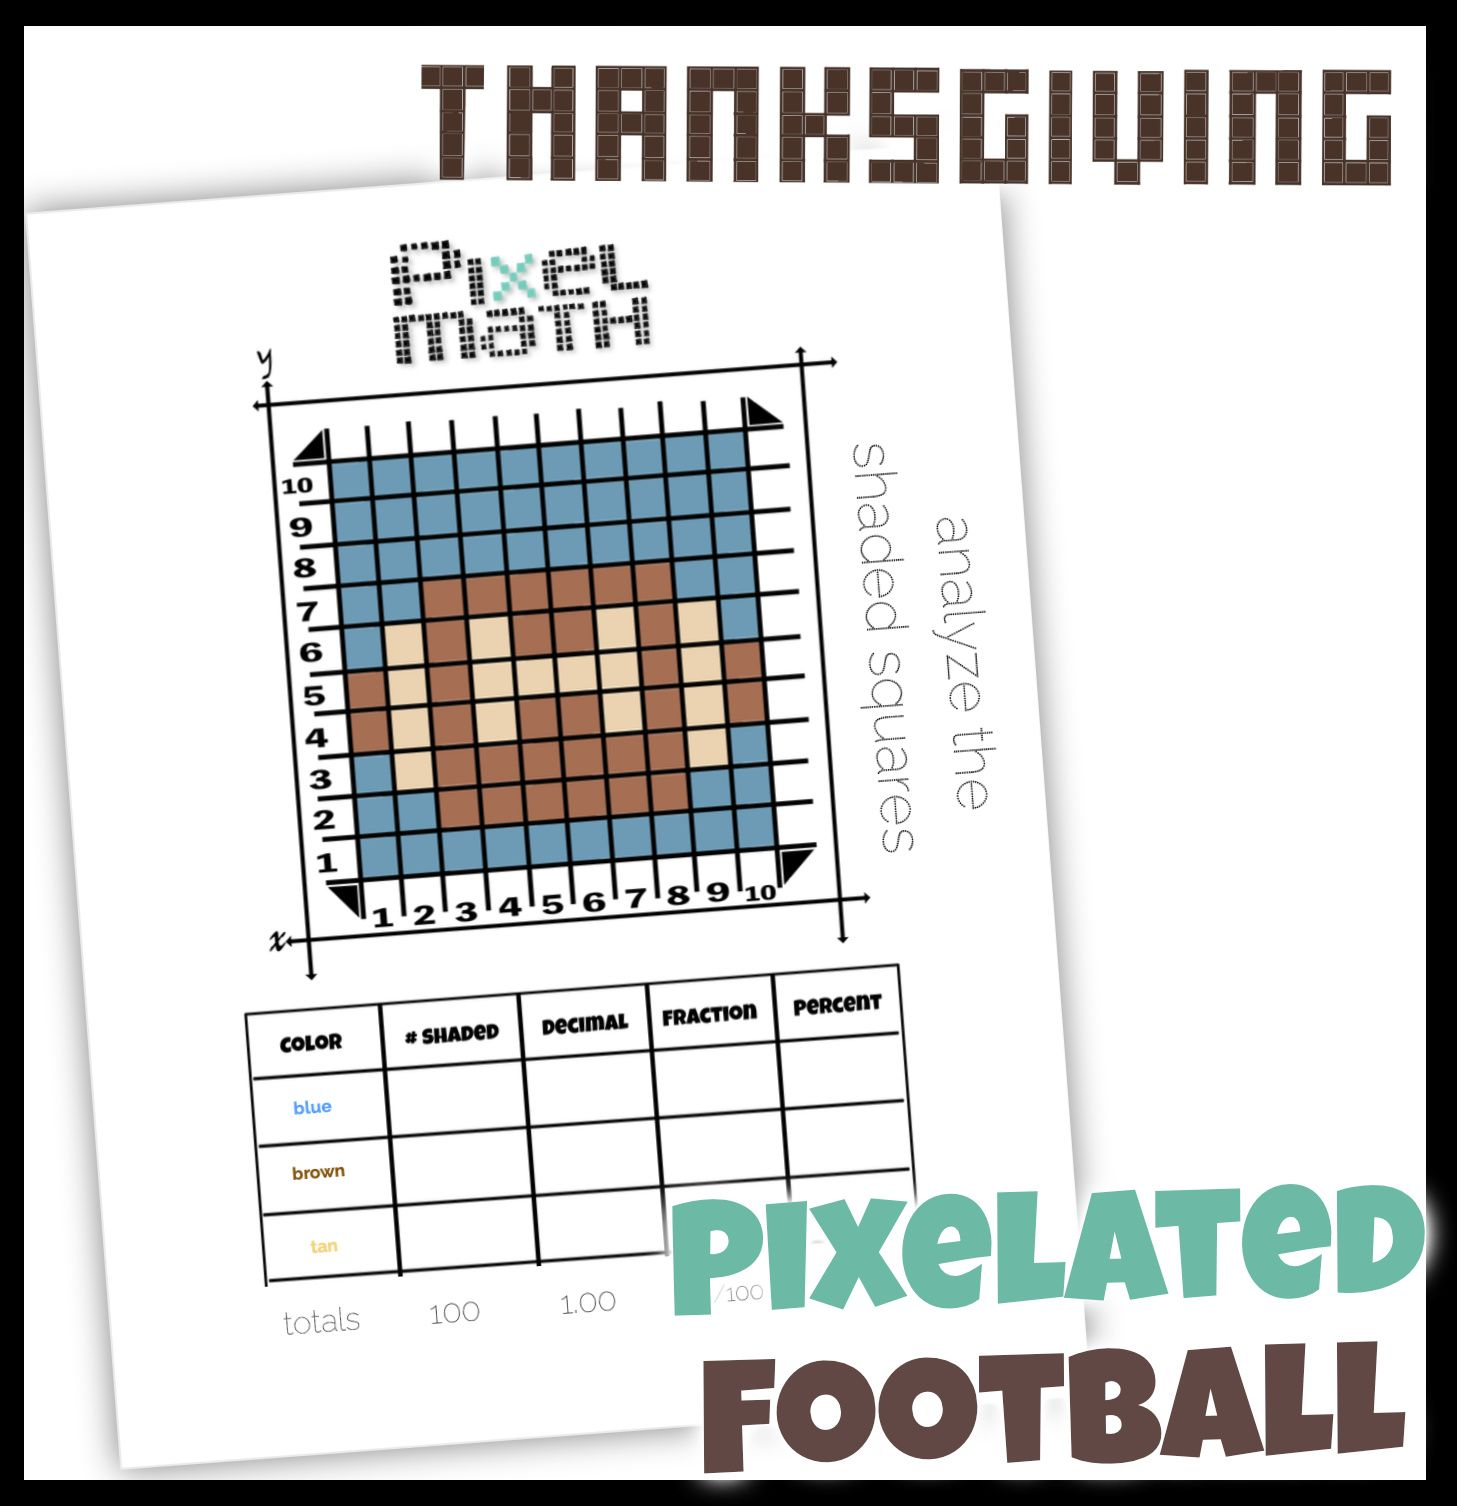 Football Pixel Art For Super Bowl Creative Way To Practice Decimal Fraction Percent Fractions Decimals Pixel [ 1506 x 1457 Pixel ]